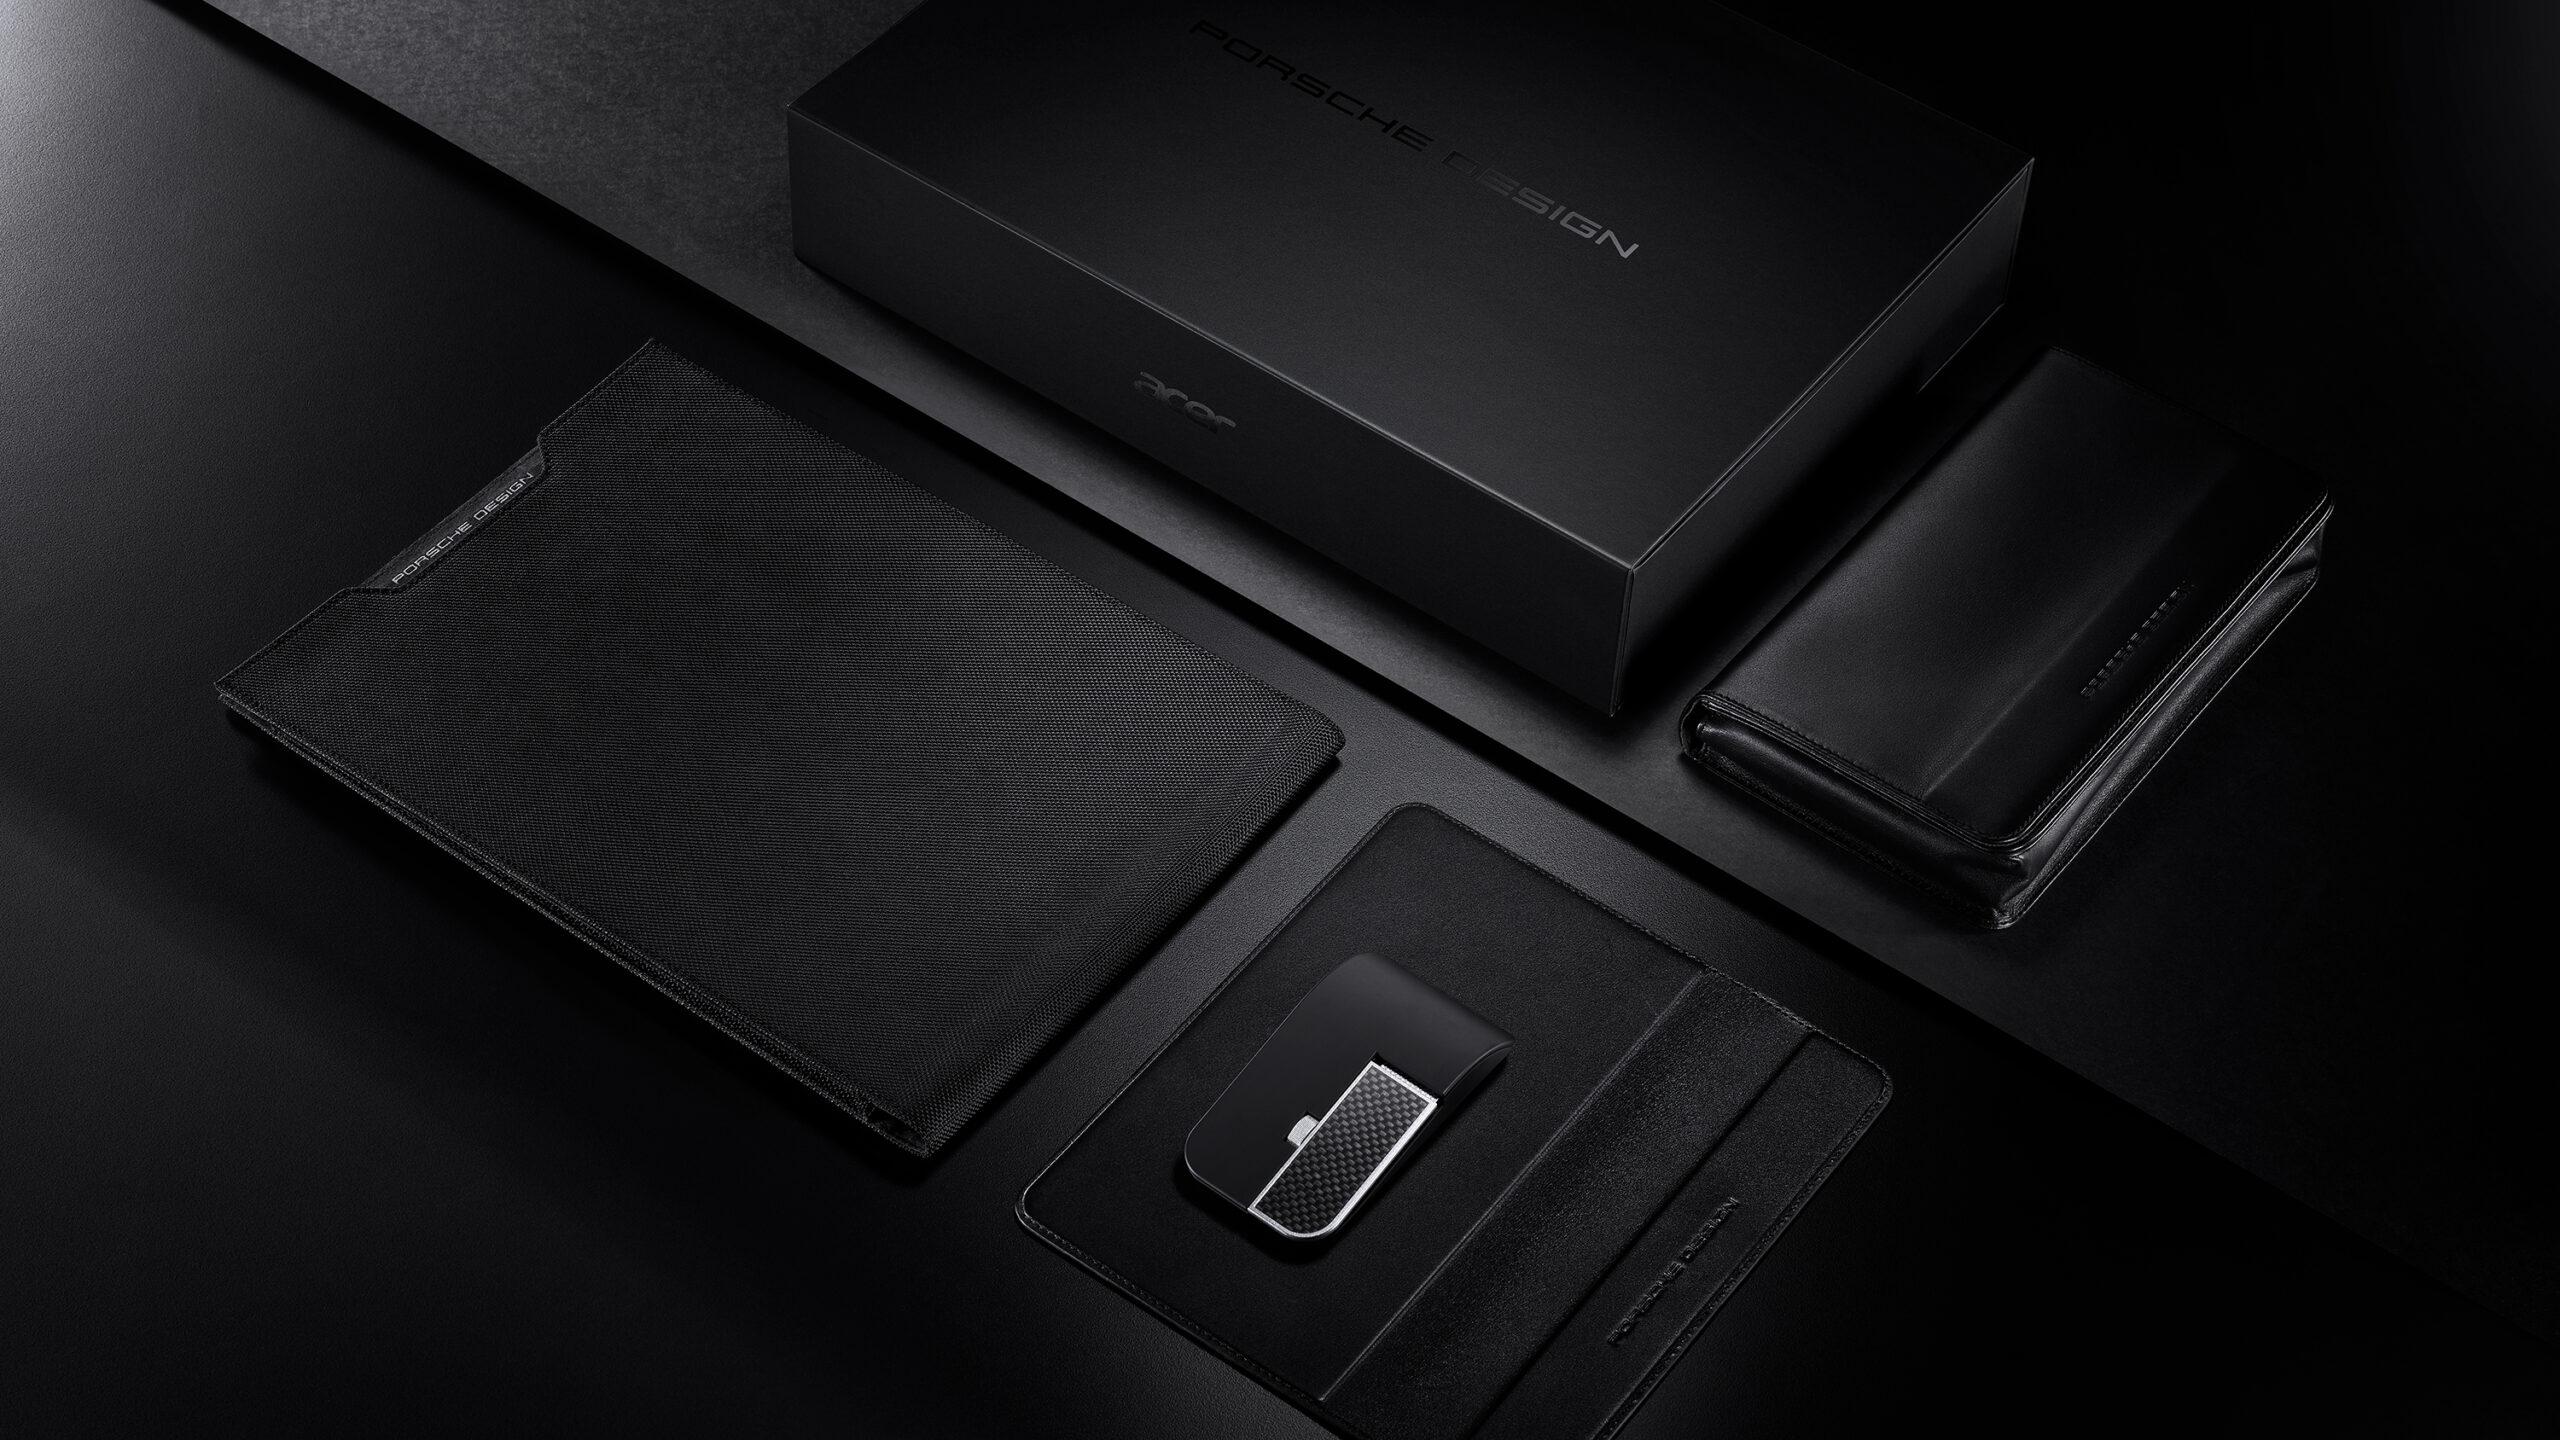 High End Elegance: The Porsche Design Acer Book RS 3